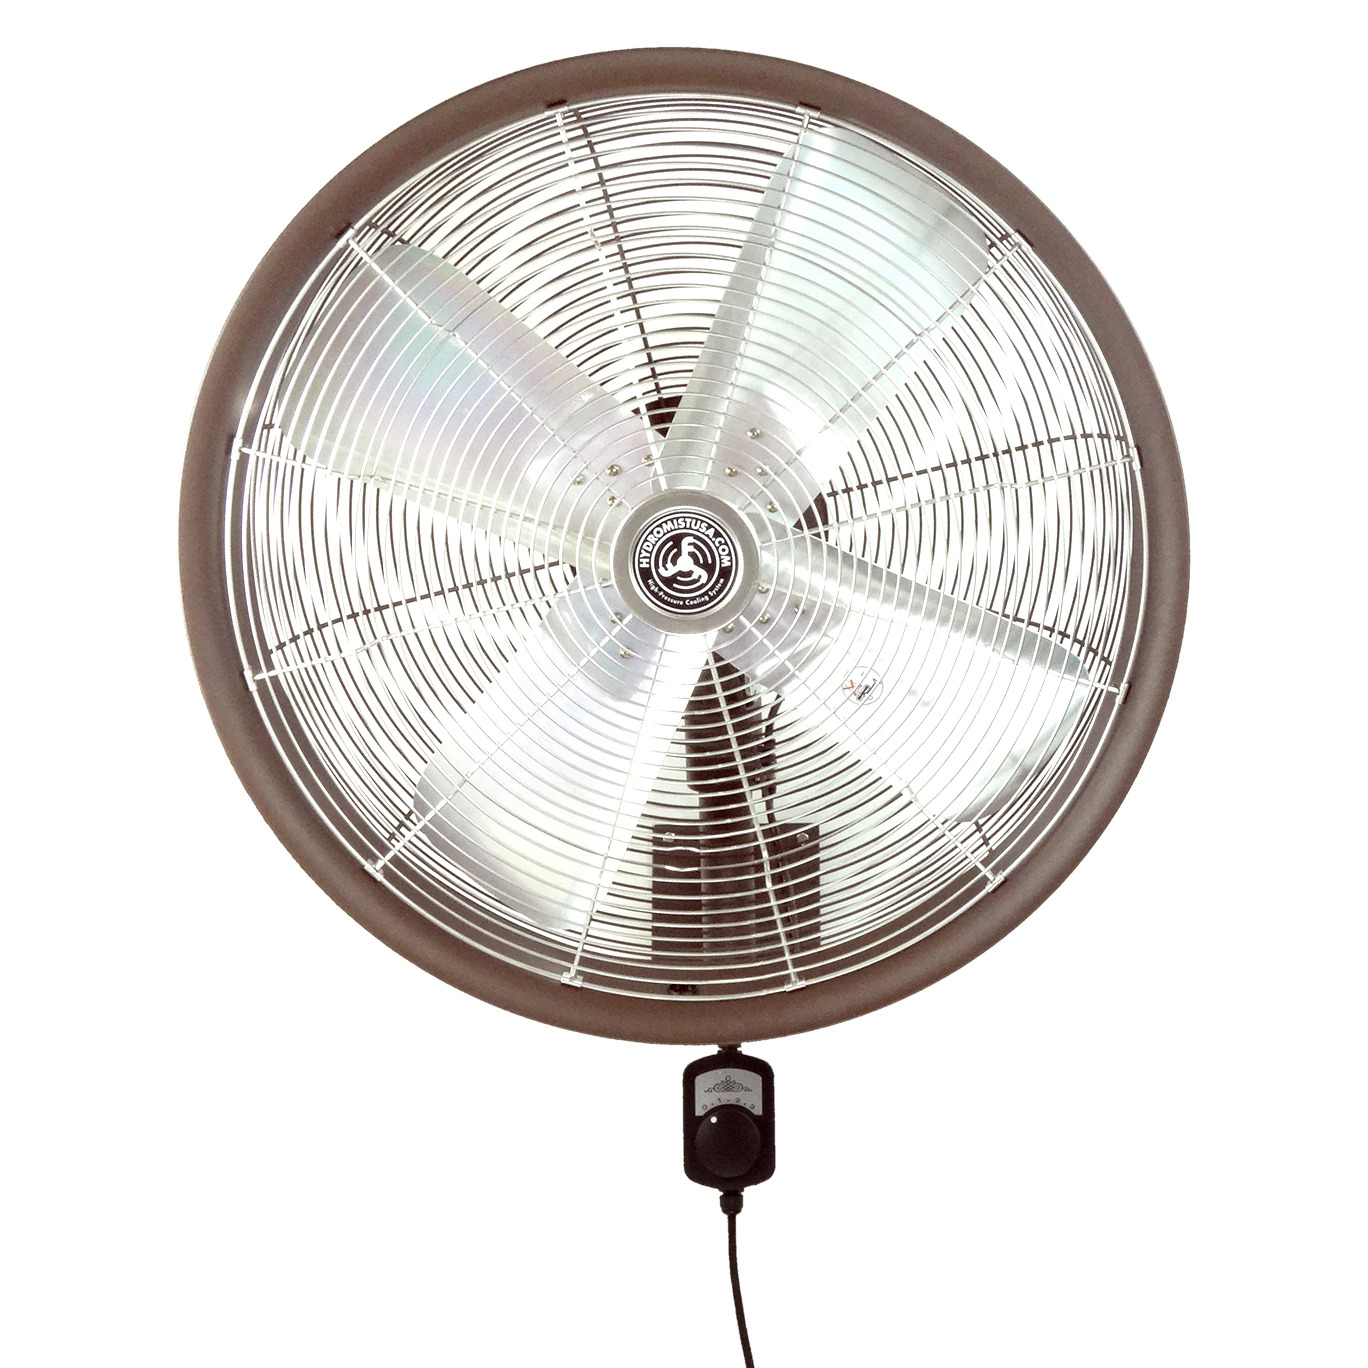 Front view of 24 Inch Shrouded Ocscillating Outdoor Indoor Fan